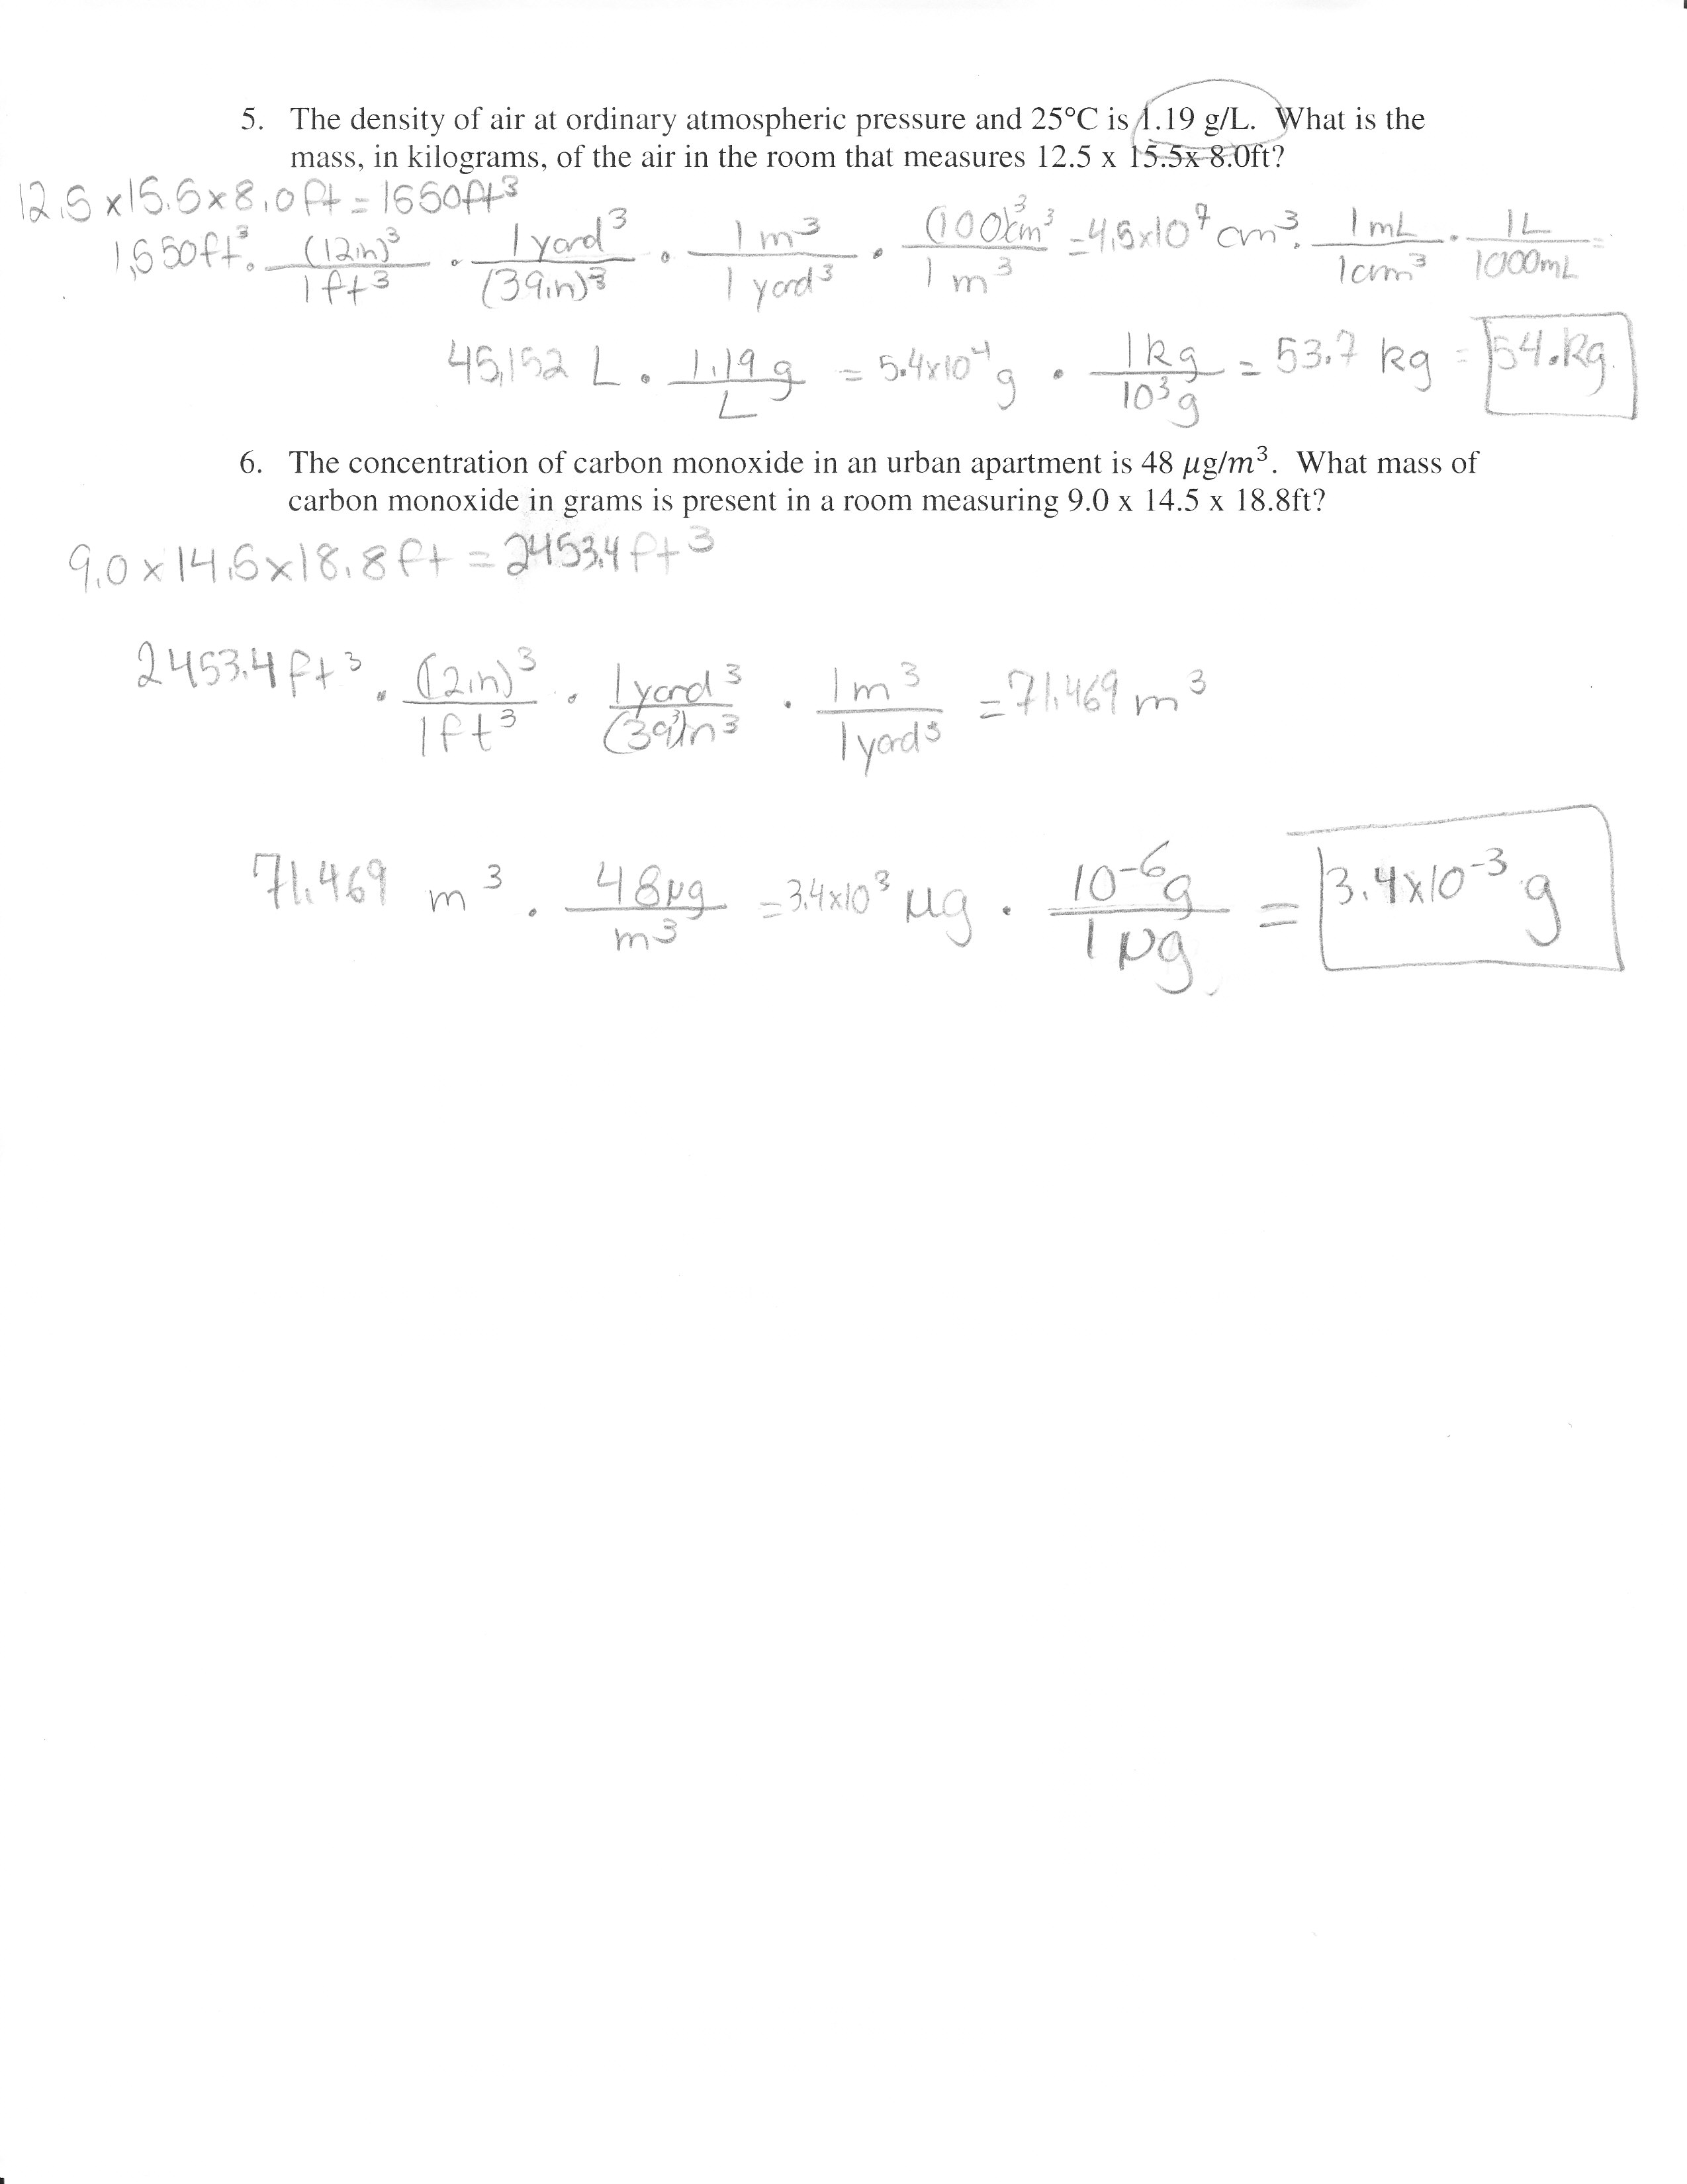 Chem 177 Supplemental Instruction